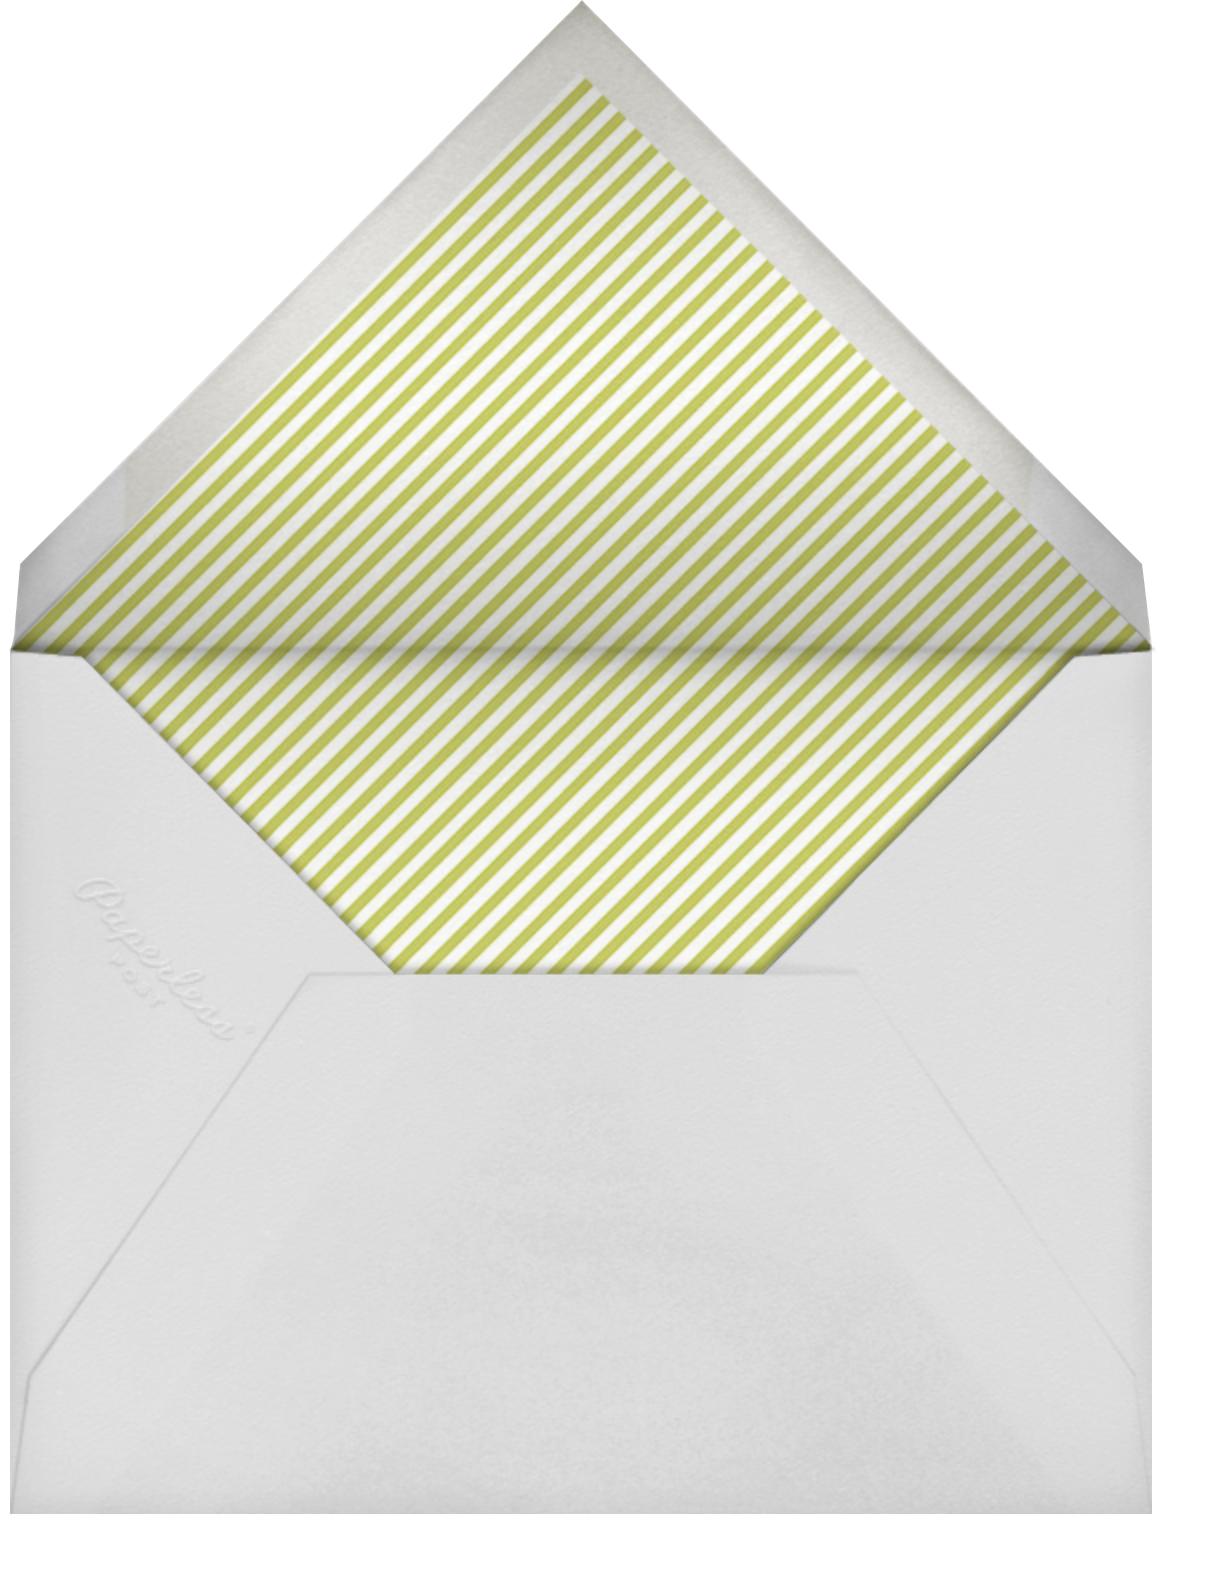 Hydrangea - Paper Source - Bridal shower - envelope back